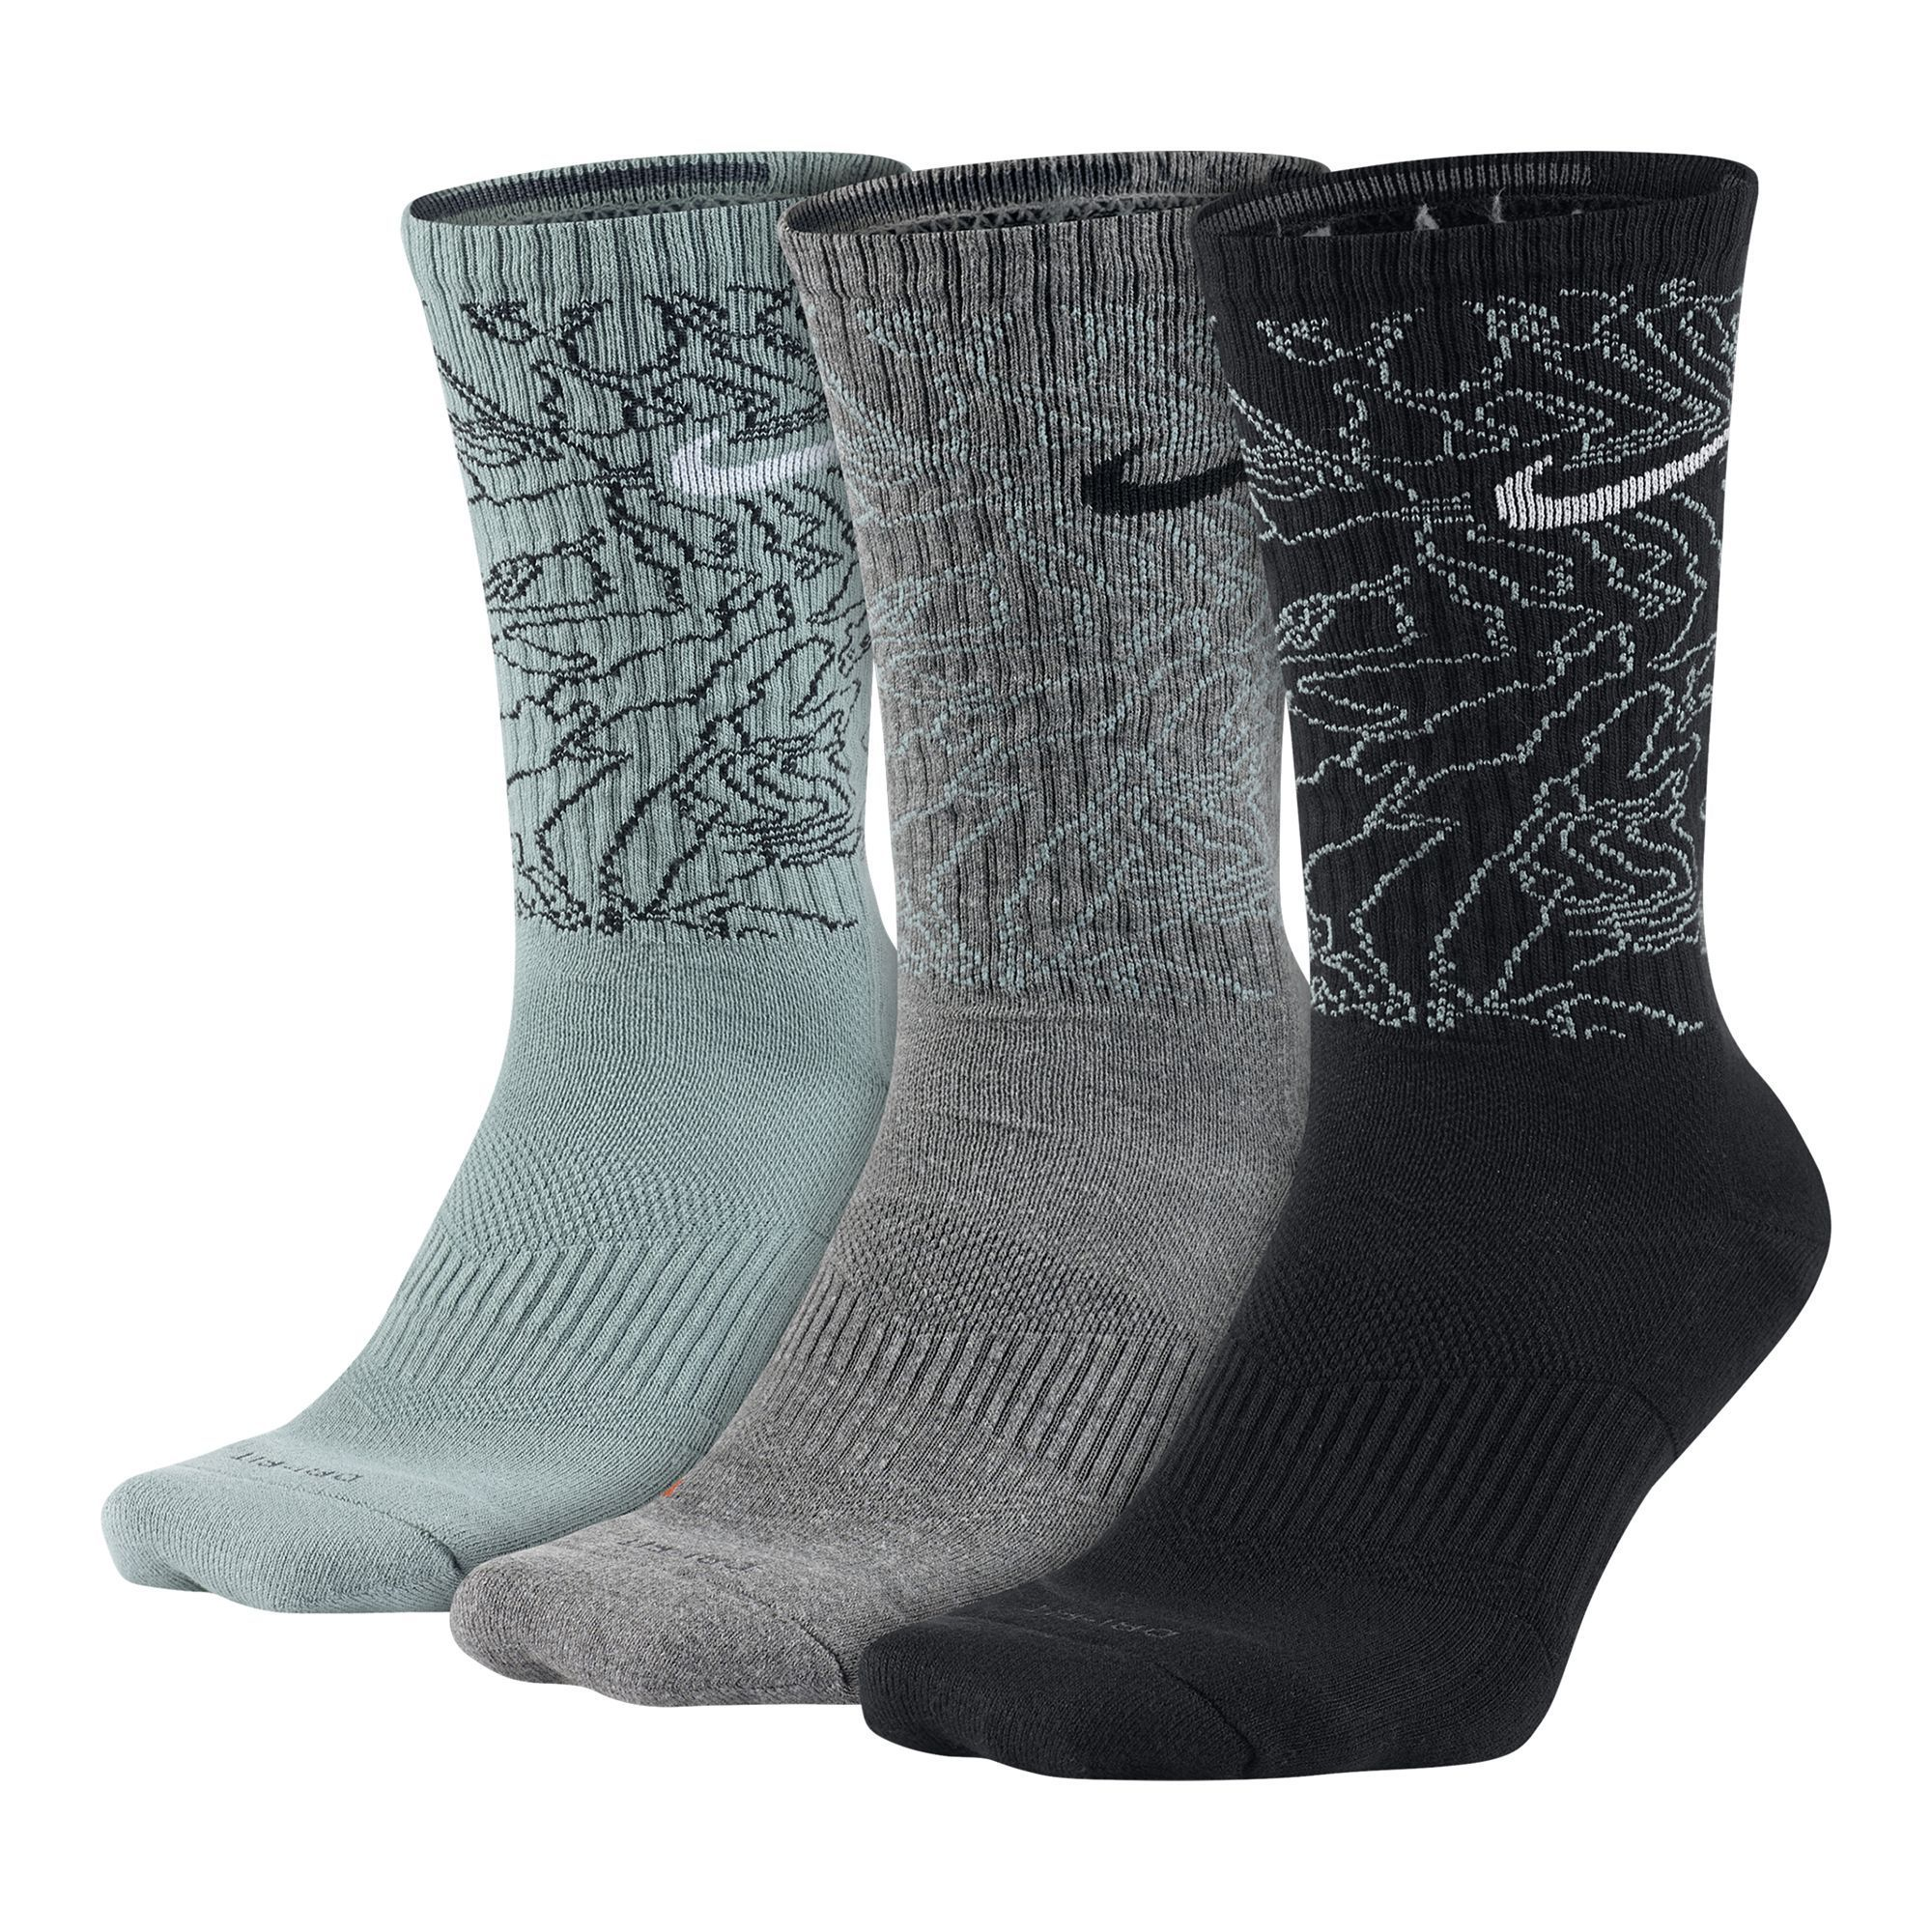 Men's Nike 3-pack Dri-FIT Triple Fly